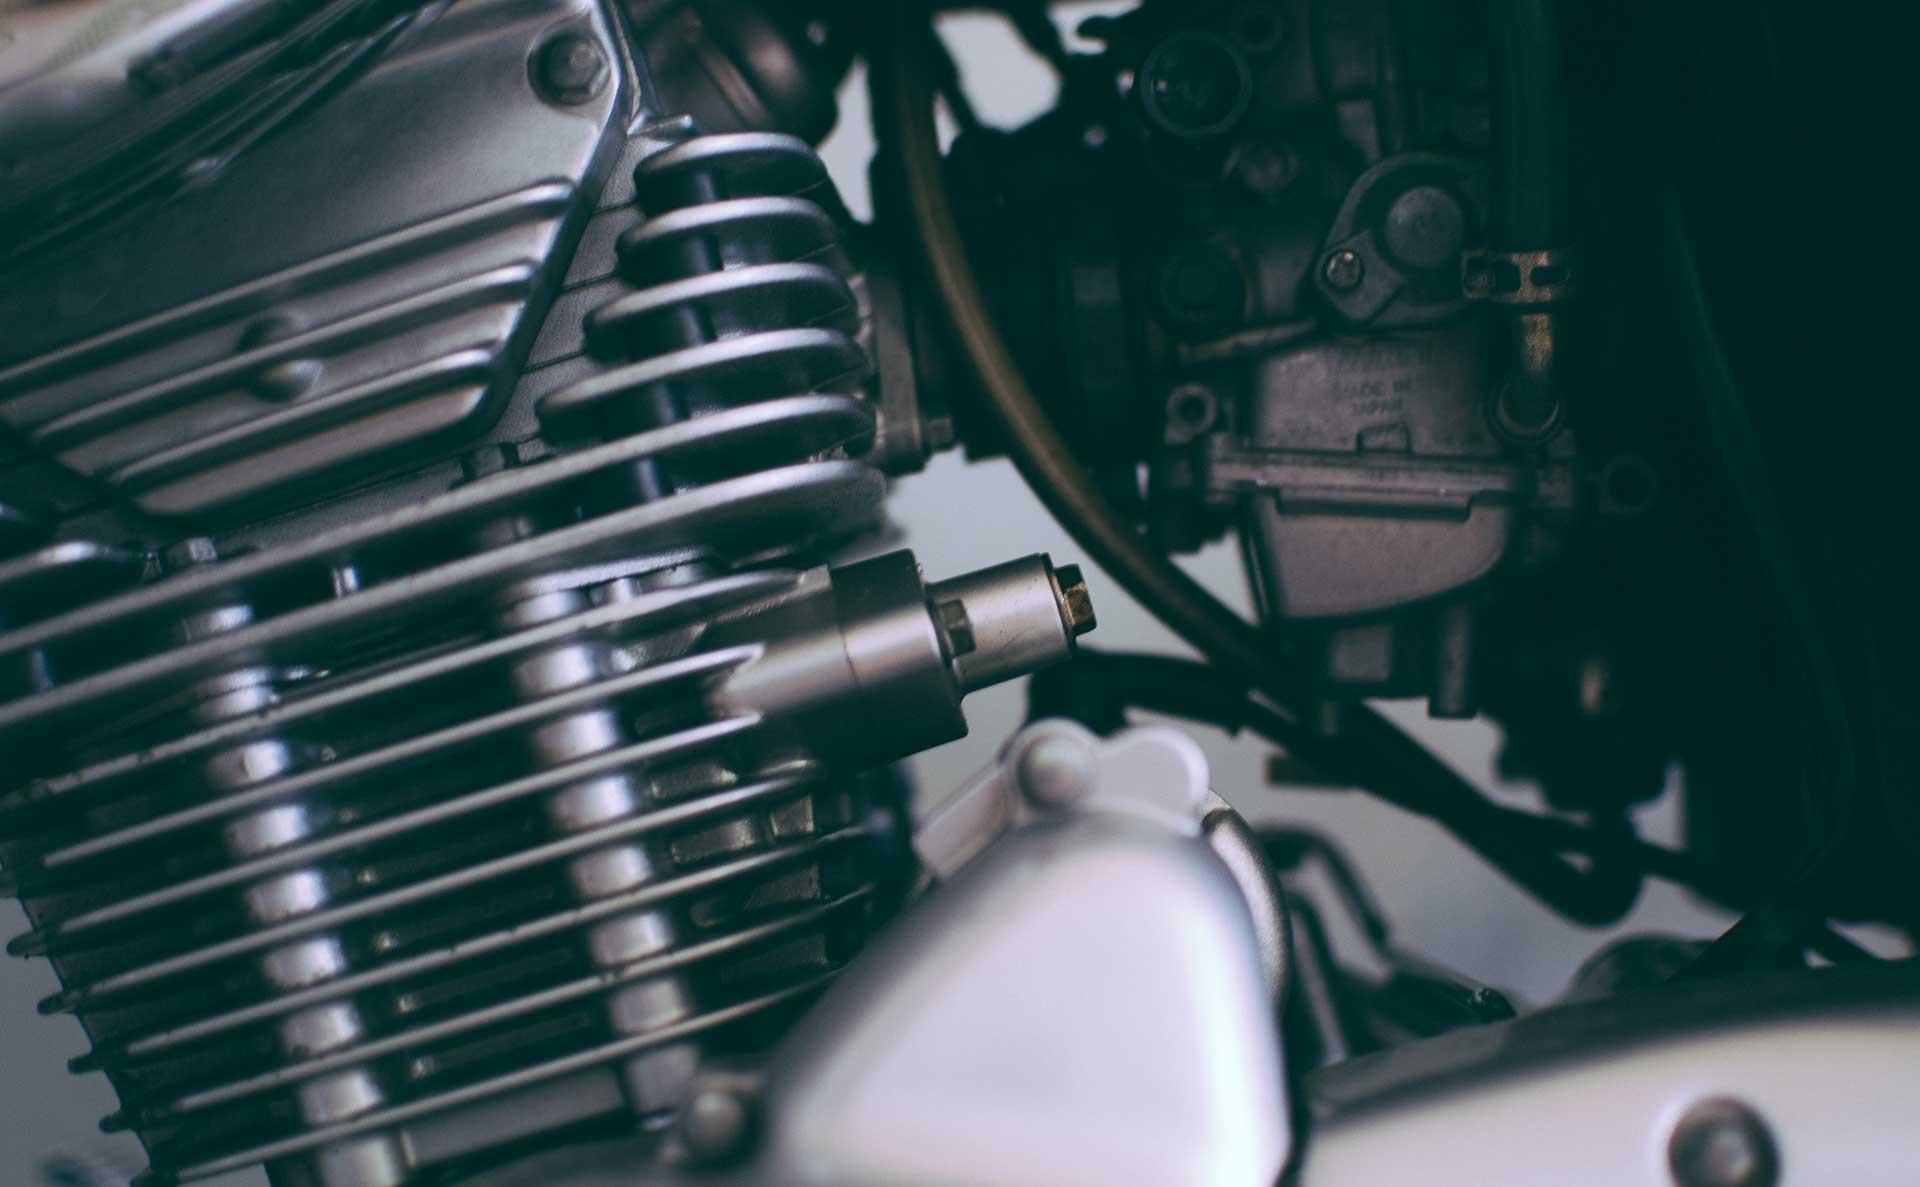 engine-heatsink-individual-parts-185545